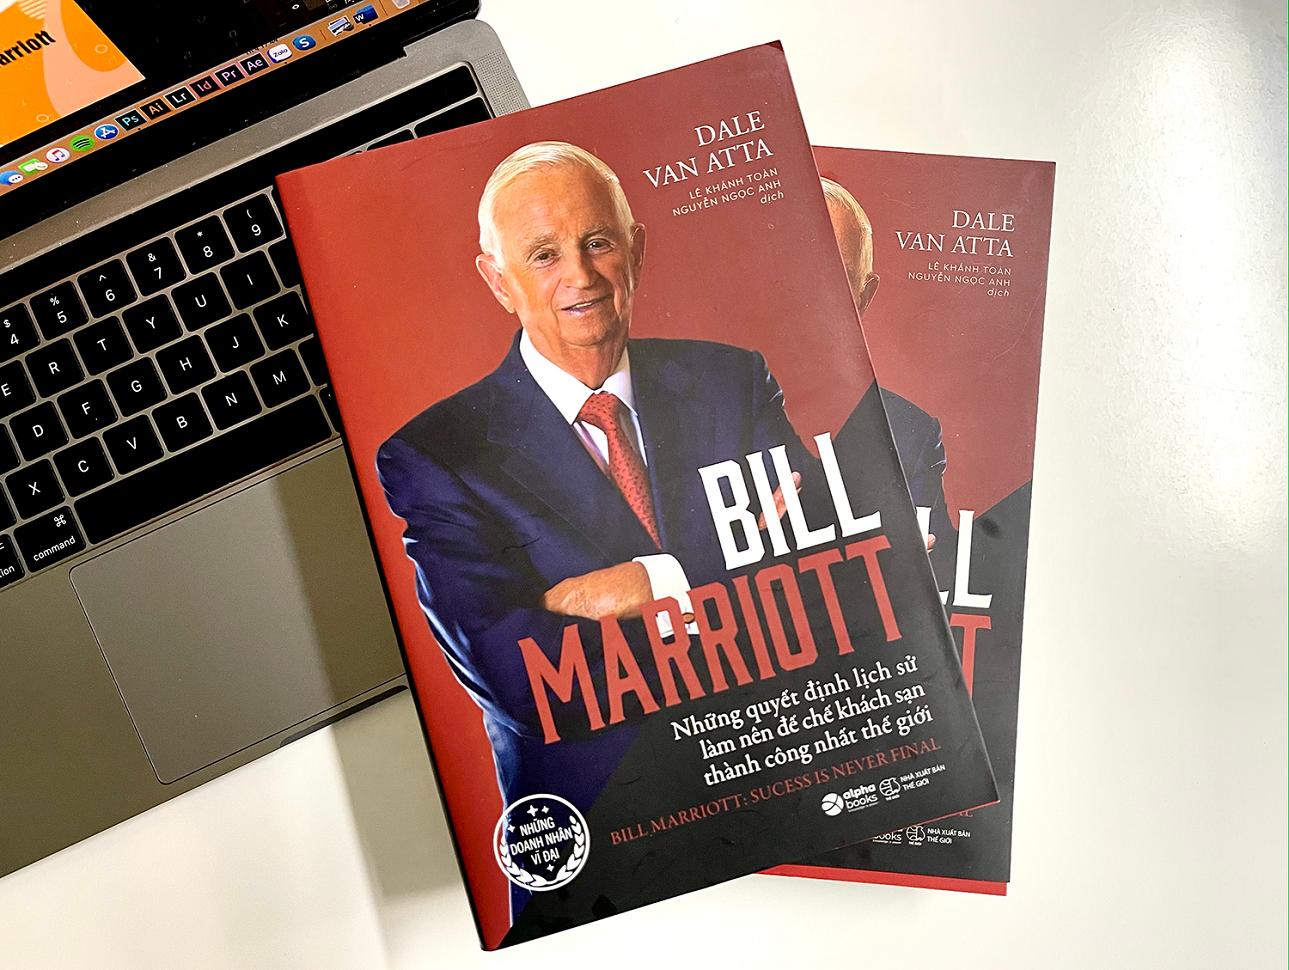 Bill-Marriott-nhung-quyet-dinh-lich-su-lam-nen-de-che-khach-san-thanh-cong-nhat-the-gioi